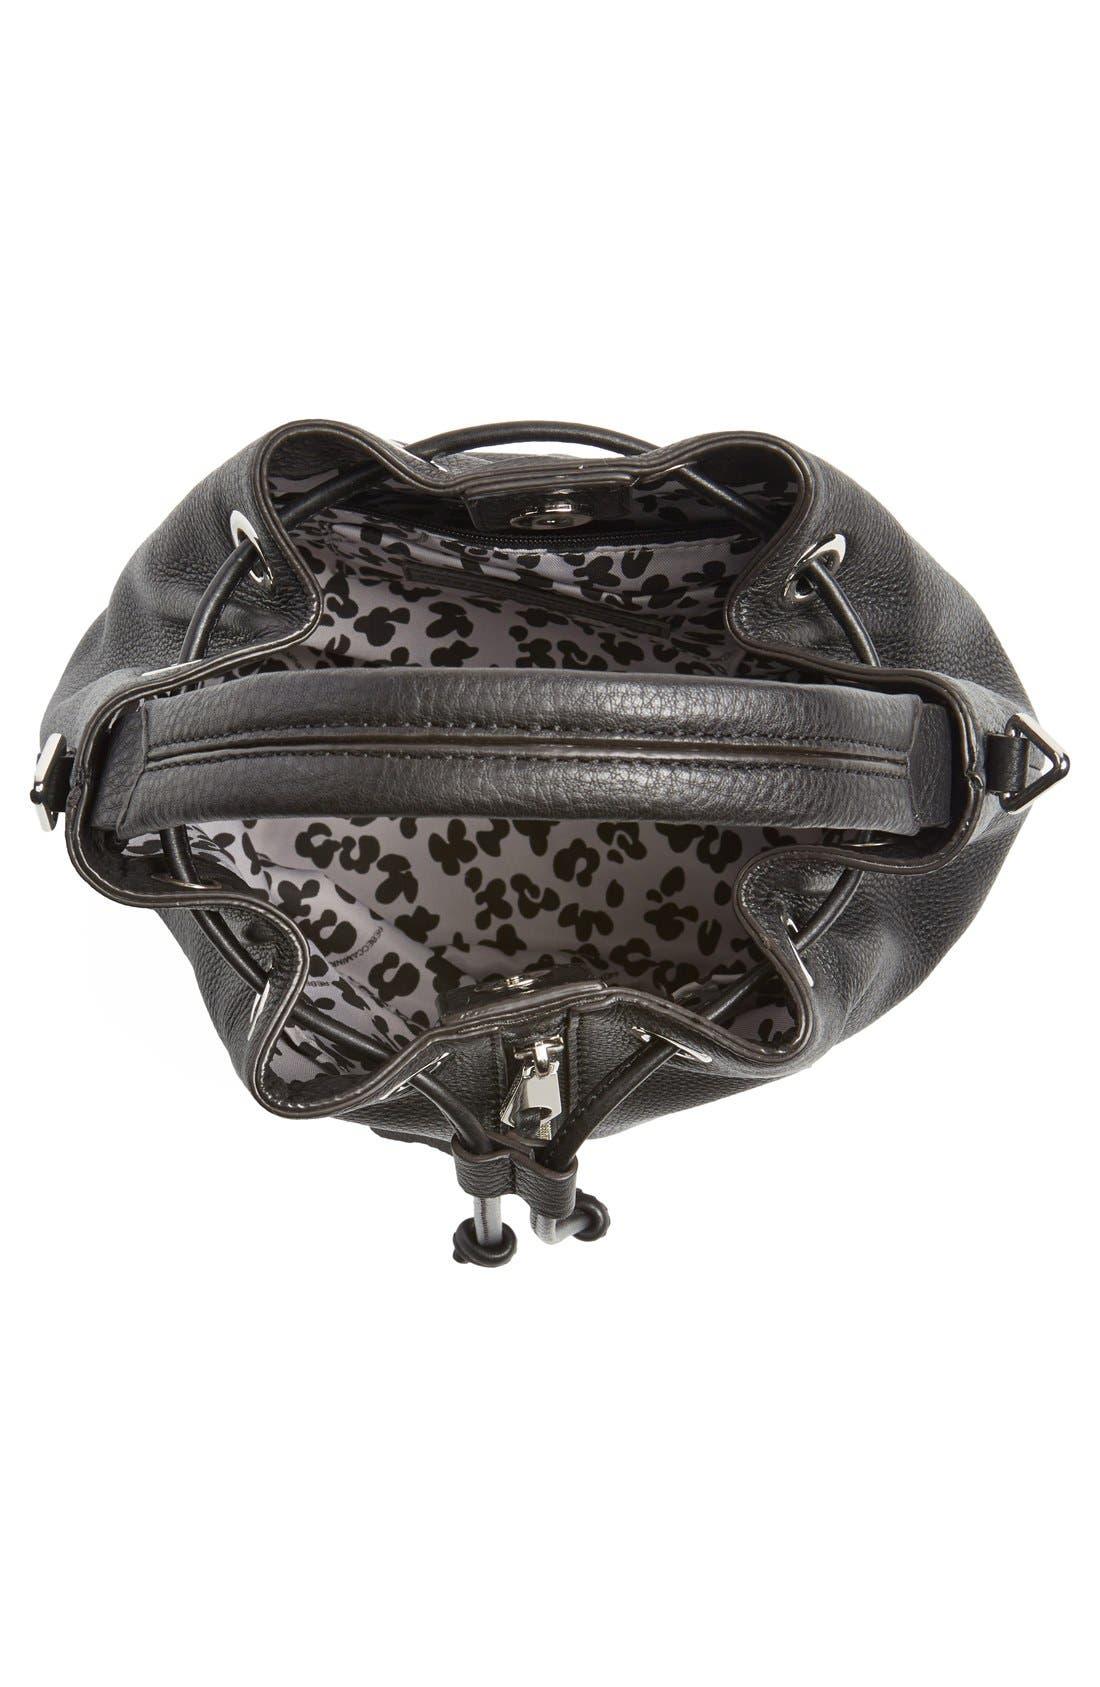 REBECCA MINKOFF, 'Moto' Bucket Bag, Alternate thumbnail 4, color, 001